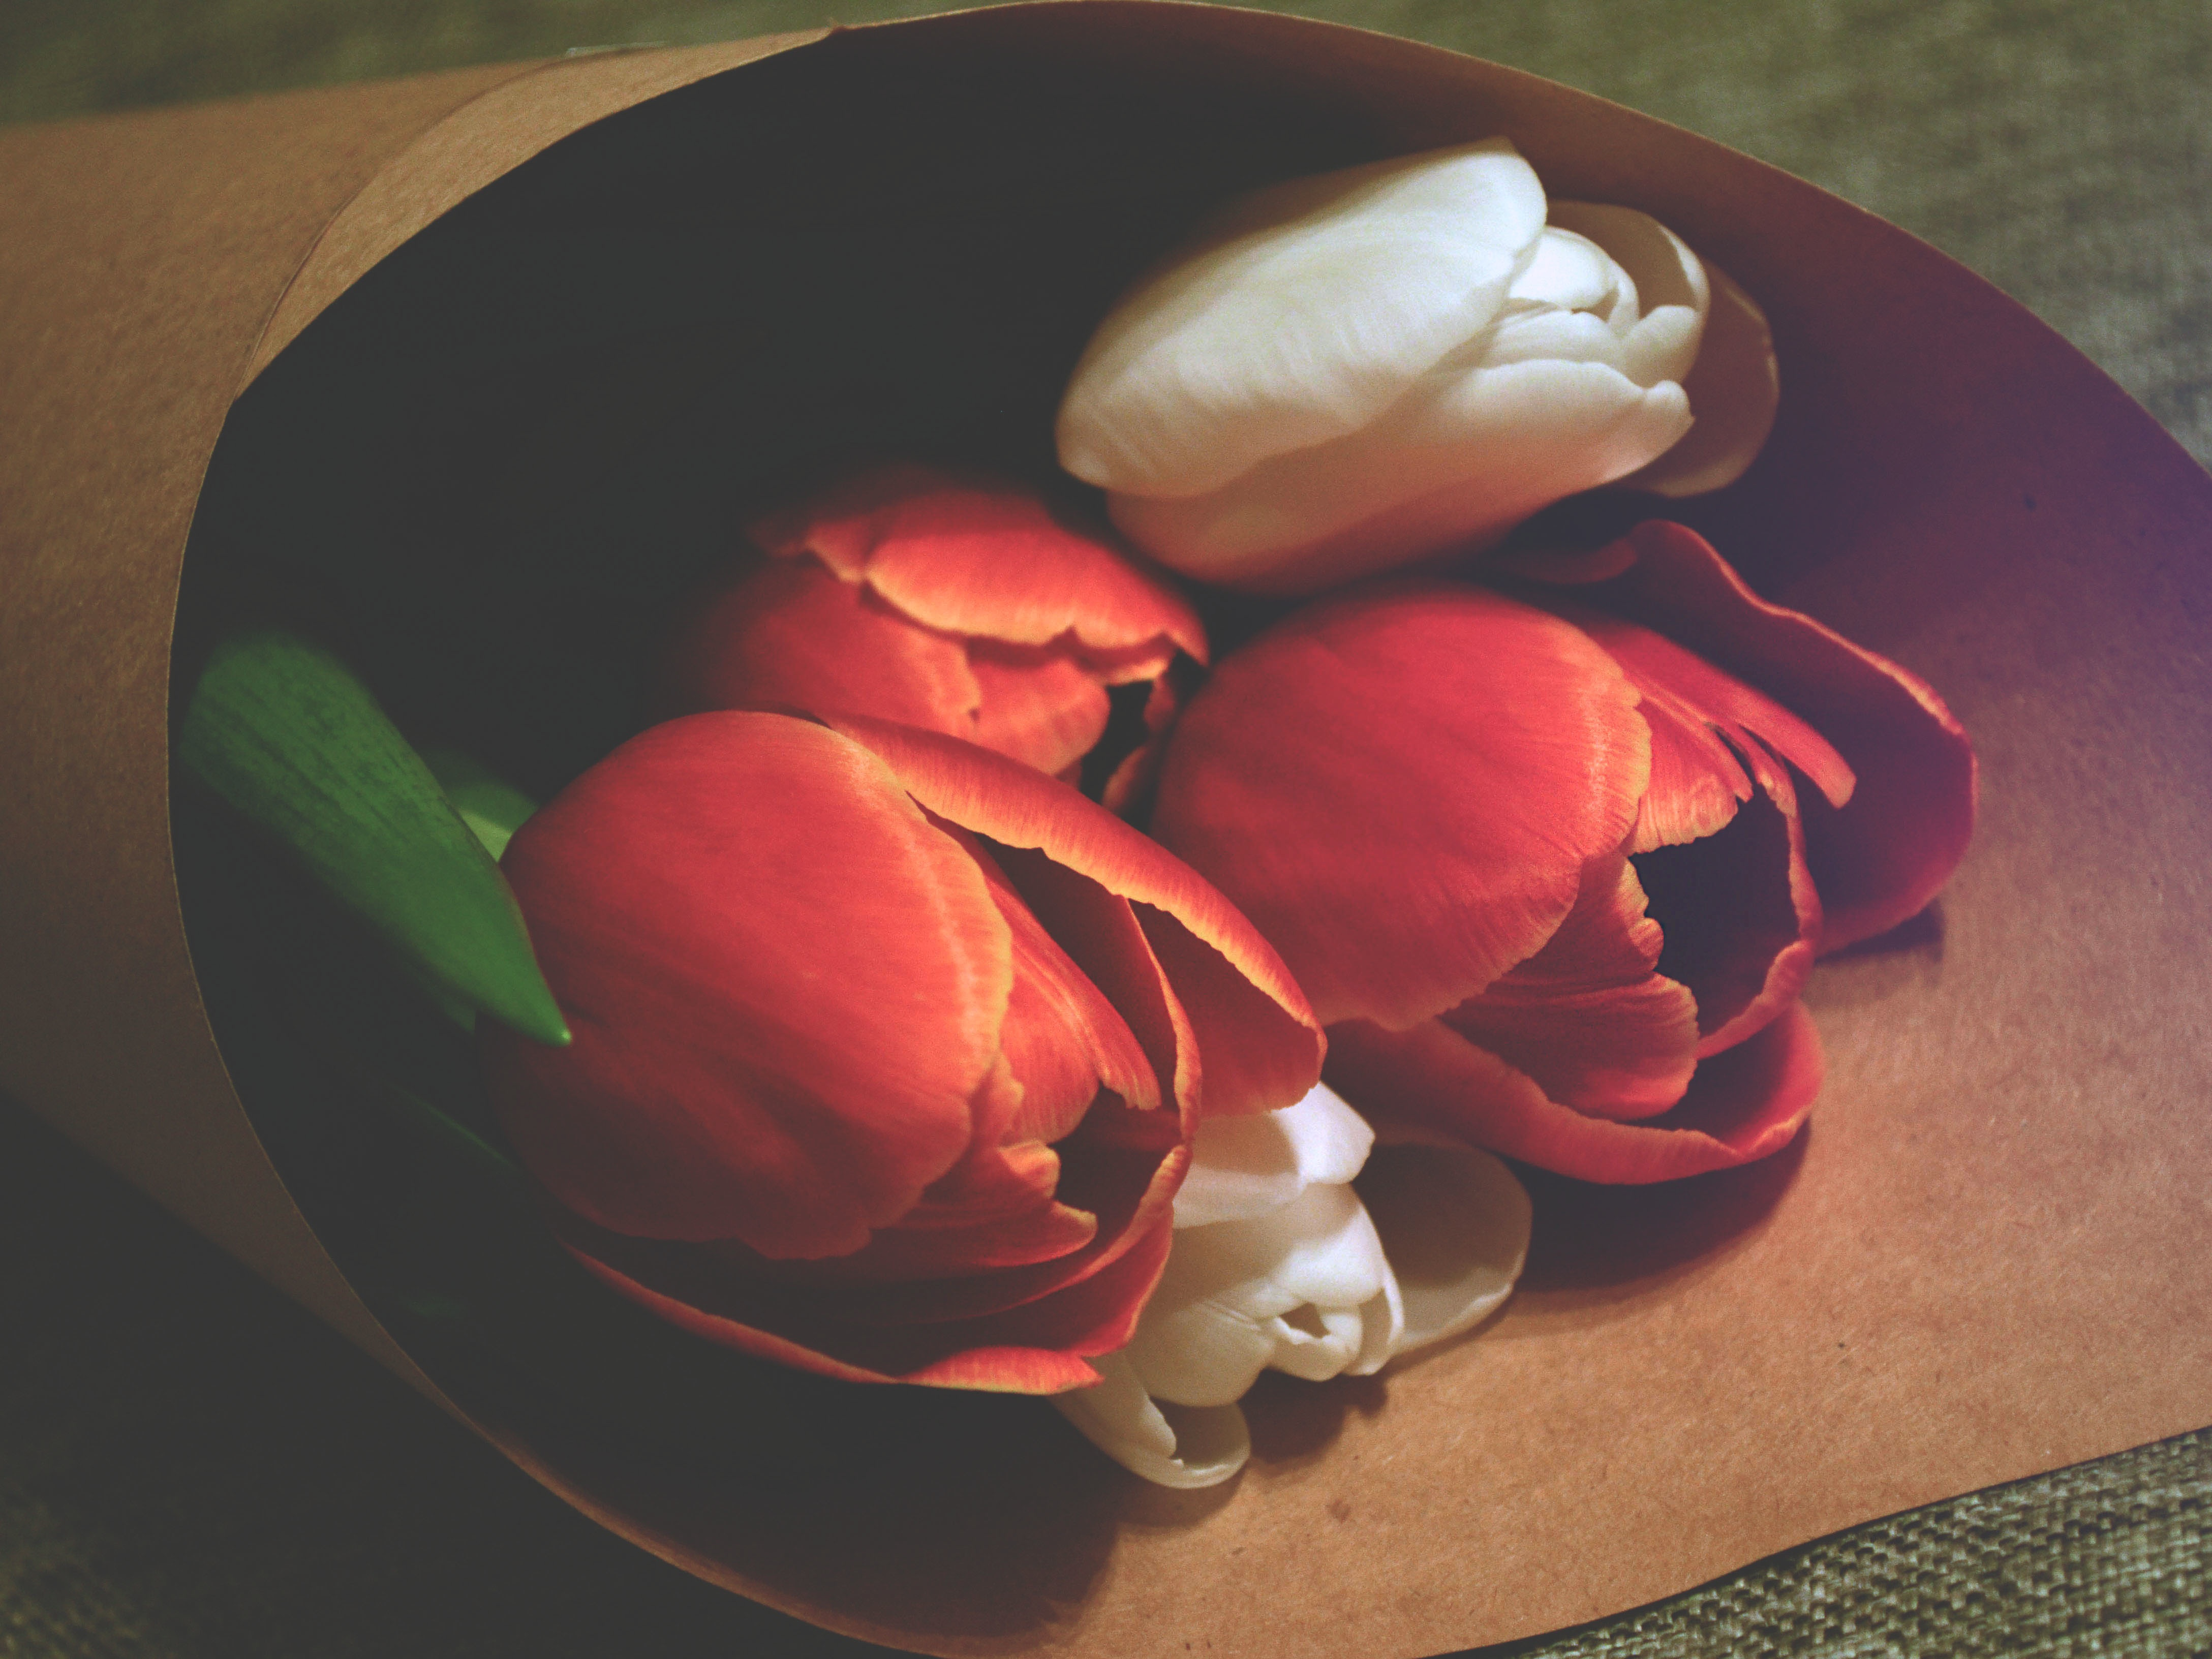 Exploring Brand Archetypes: The Caregiver